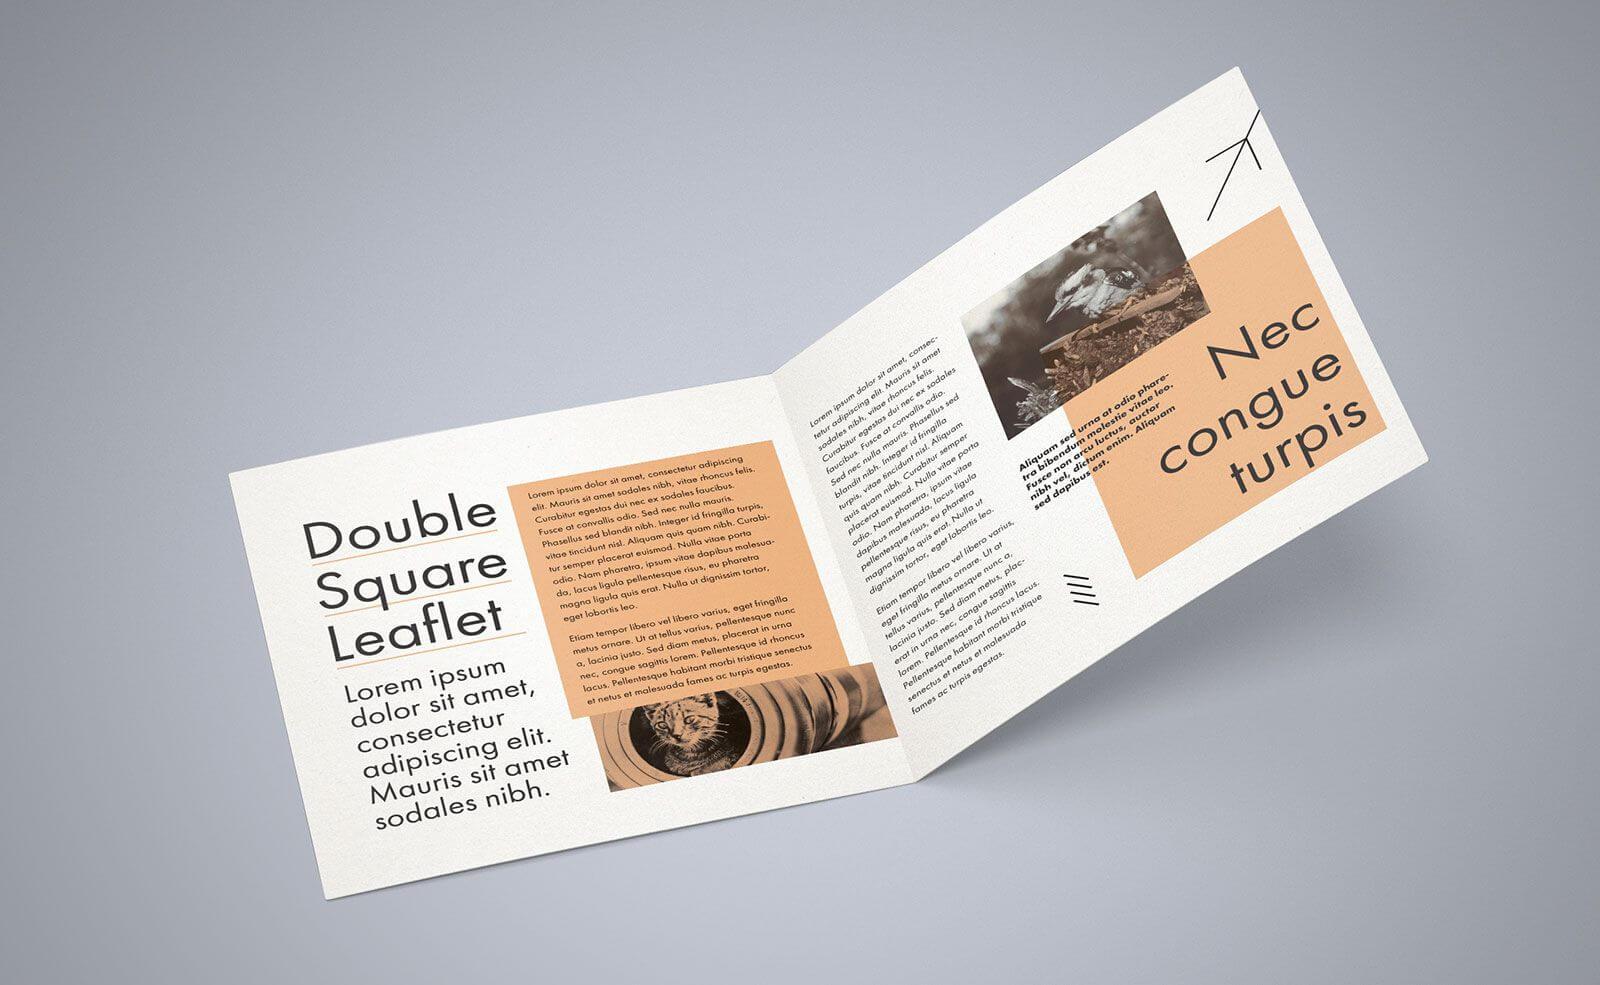 Free Square Bi Fold Brochure Mockup Psd File 2 | Bi Fold Intended For 2 Fold Brochure Template Free